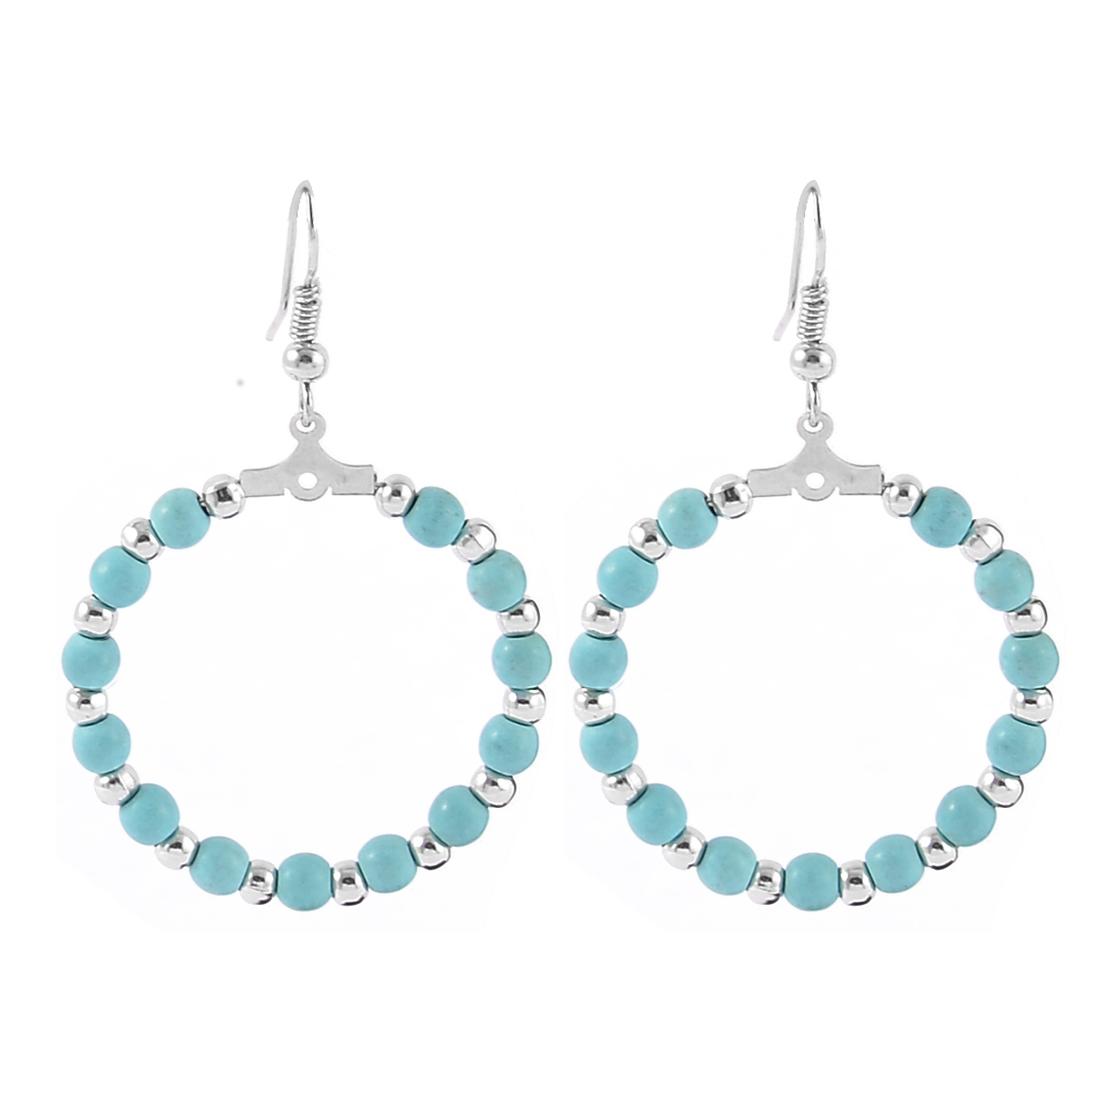 Lady Women Fashion Jewelry Circle Beads Dangle Earrings Pair Silver Tone Blue